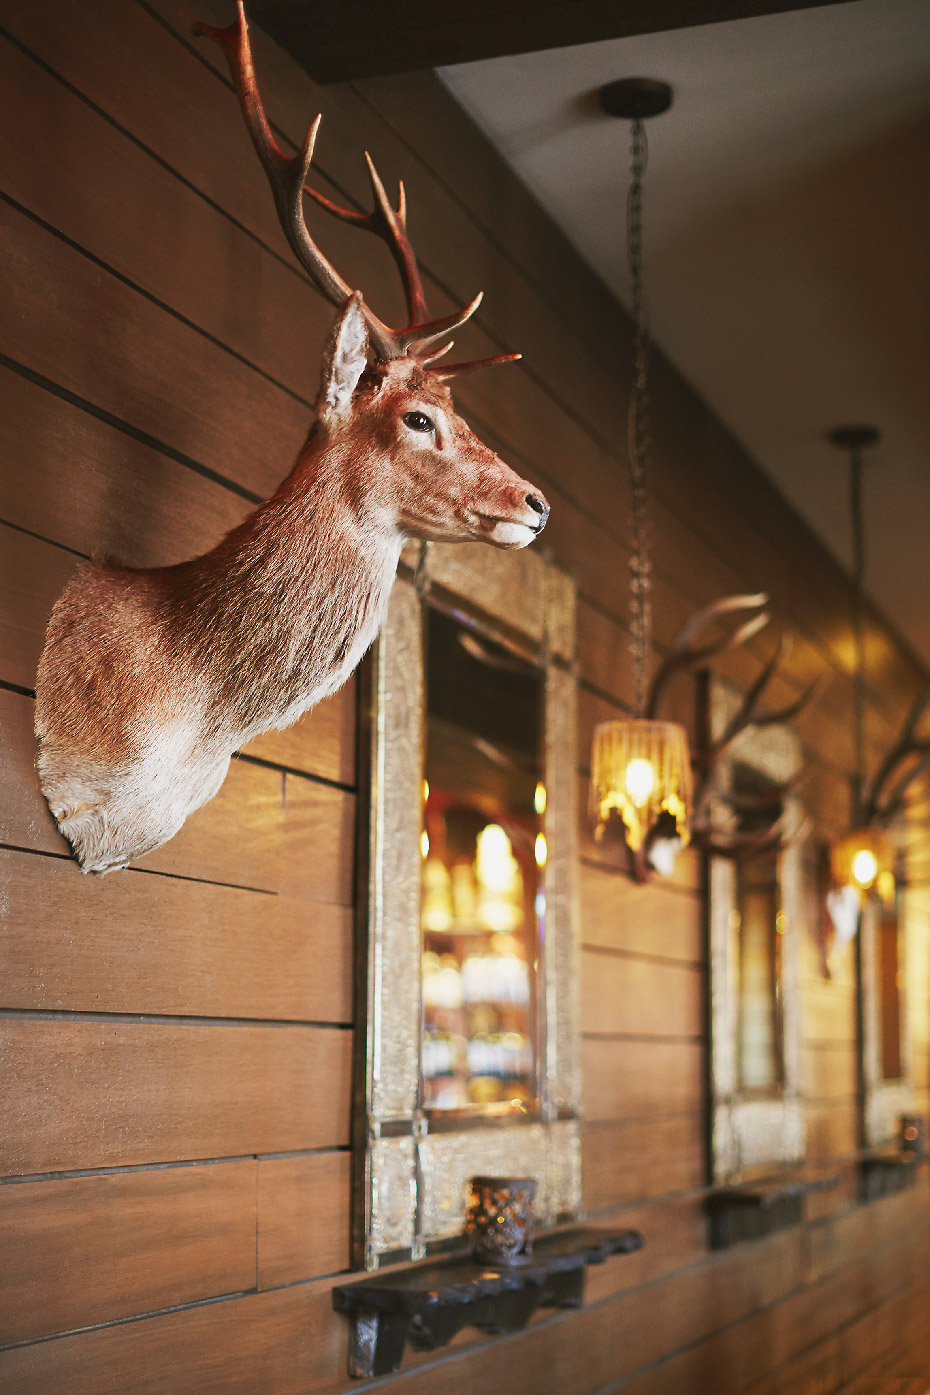 Stacey Van Berkel Photography I Rustic Decor I Grand Bohemian Hotel I Asheville, North Carolina